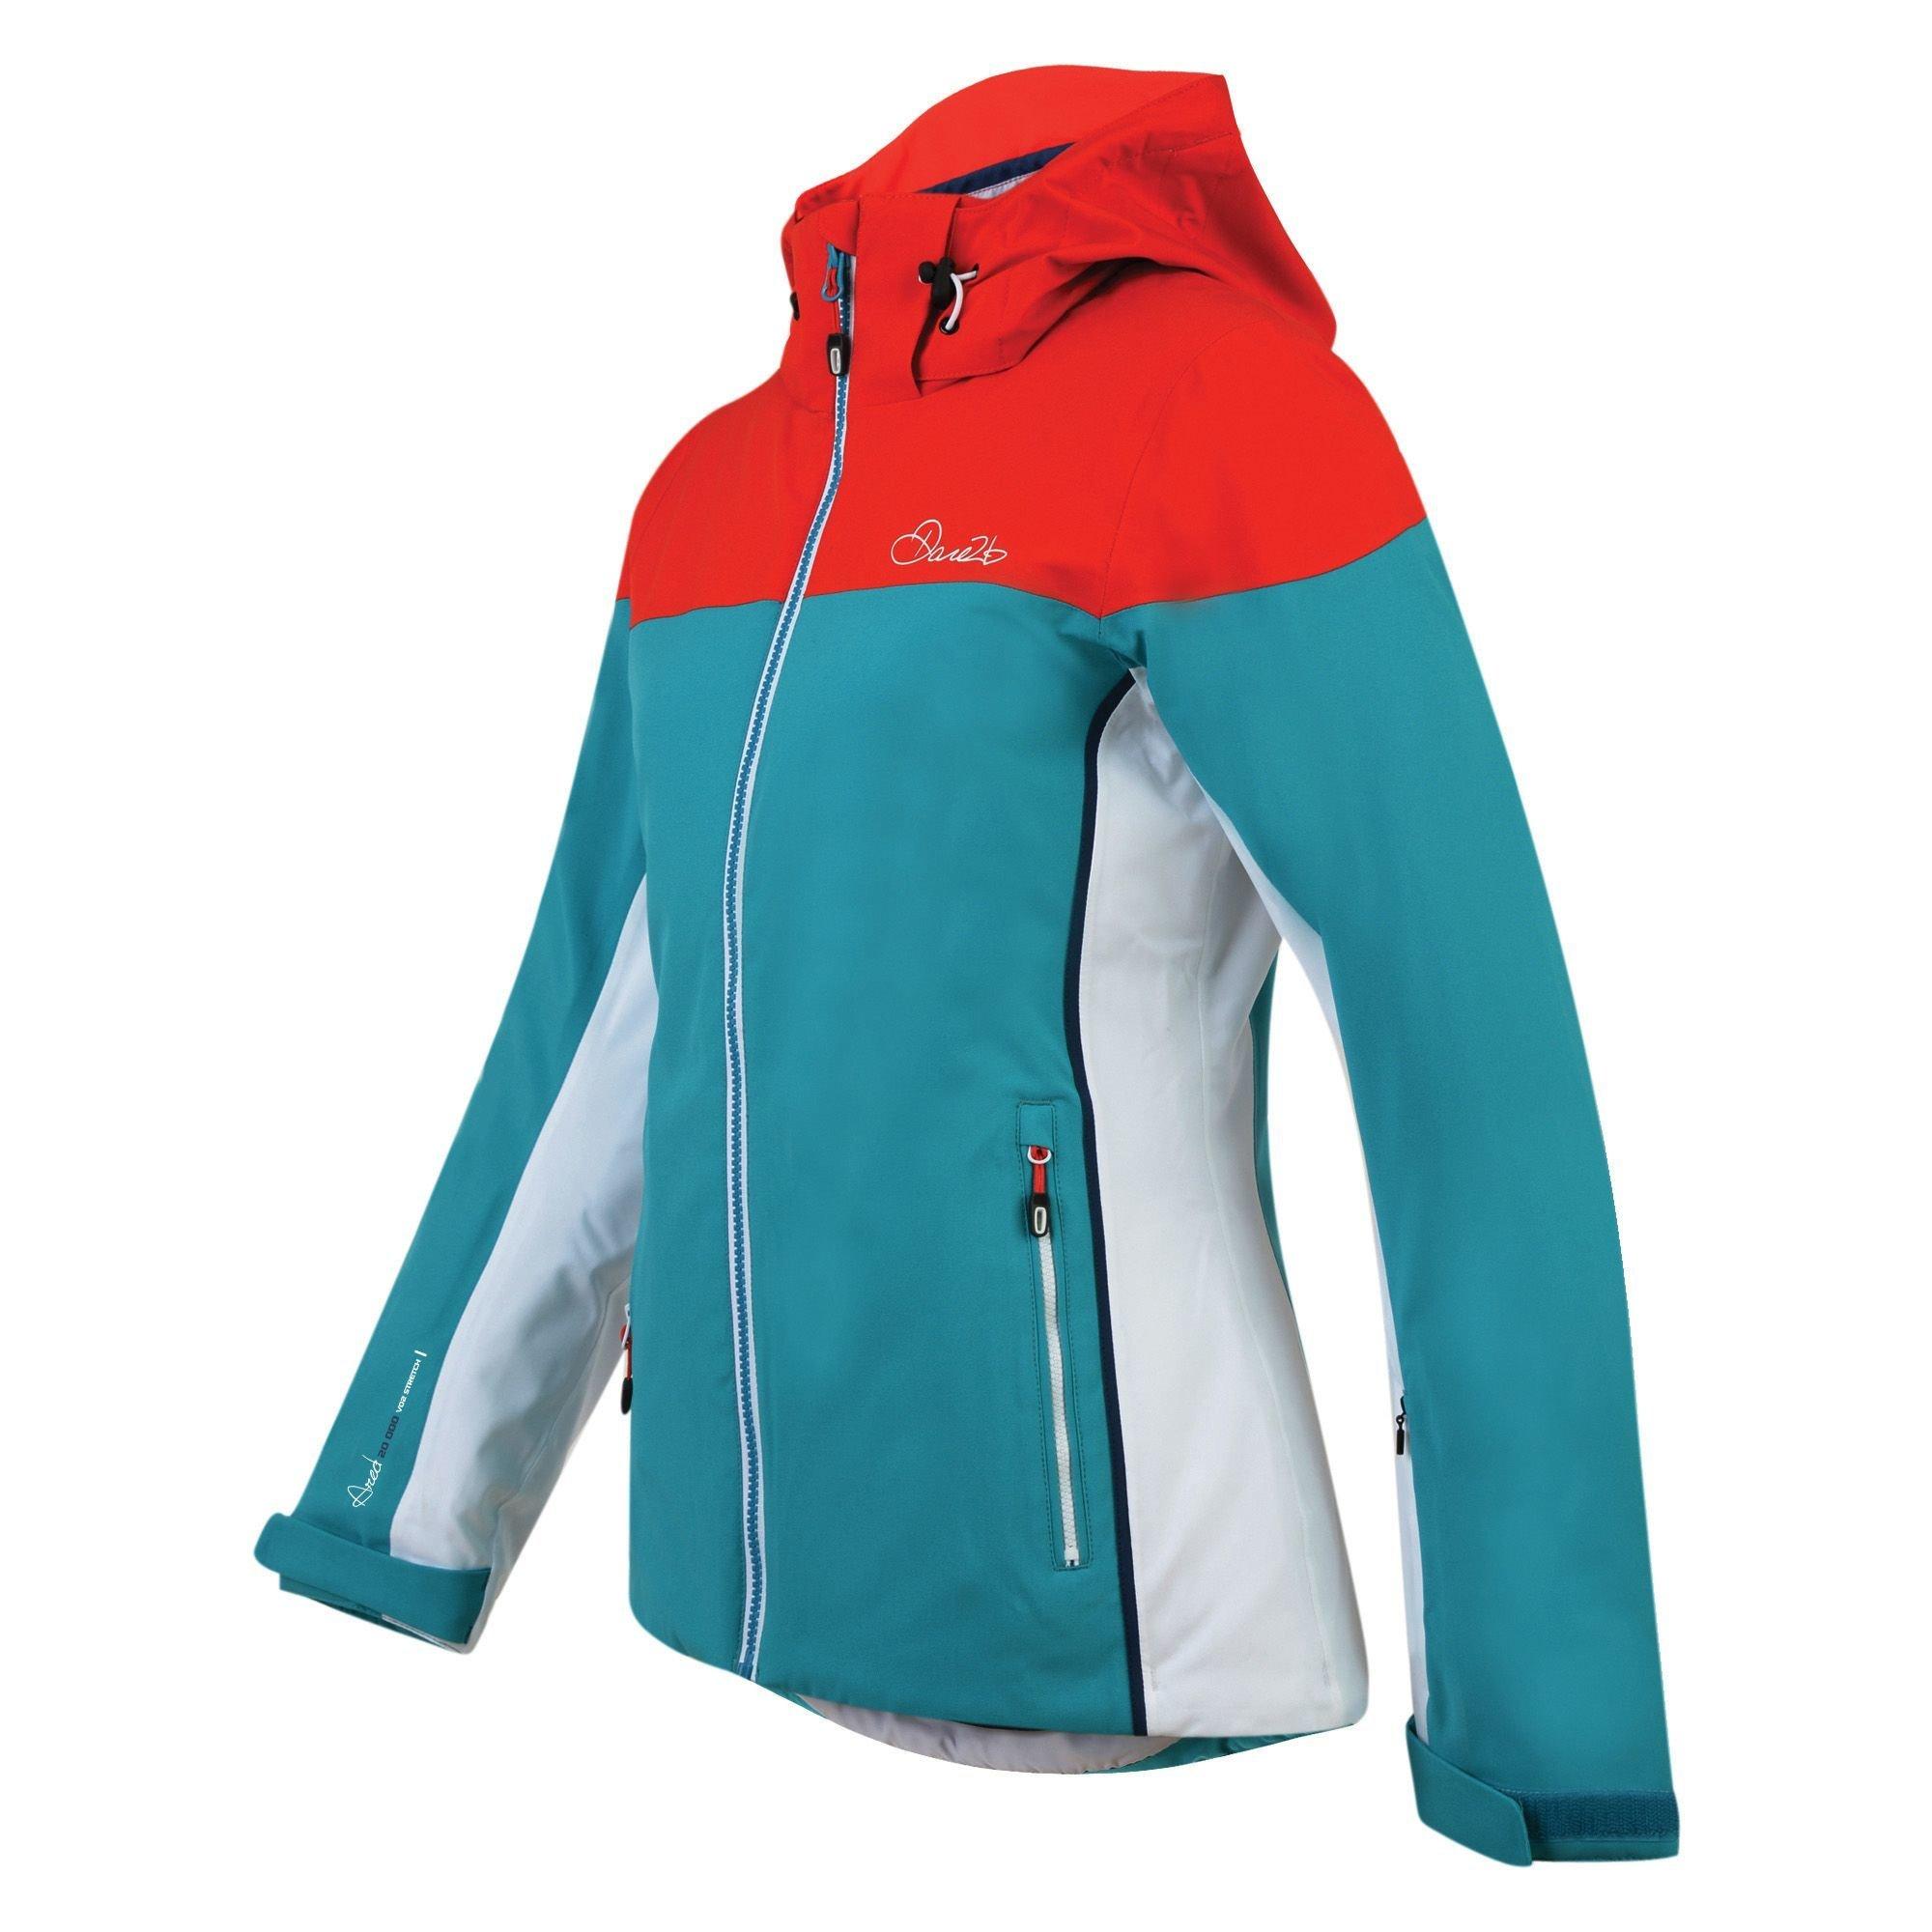 Dare 2b Women's Invoke II Ski Jacket Sea DAR-1044